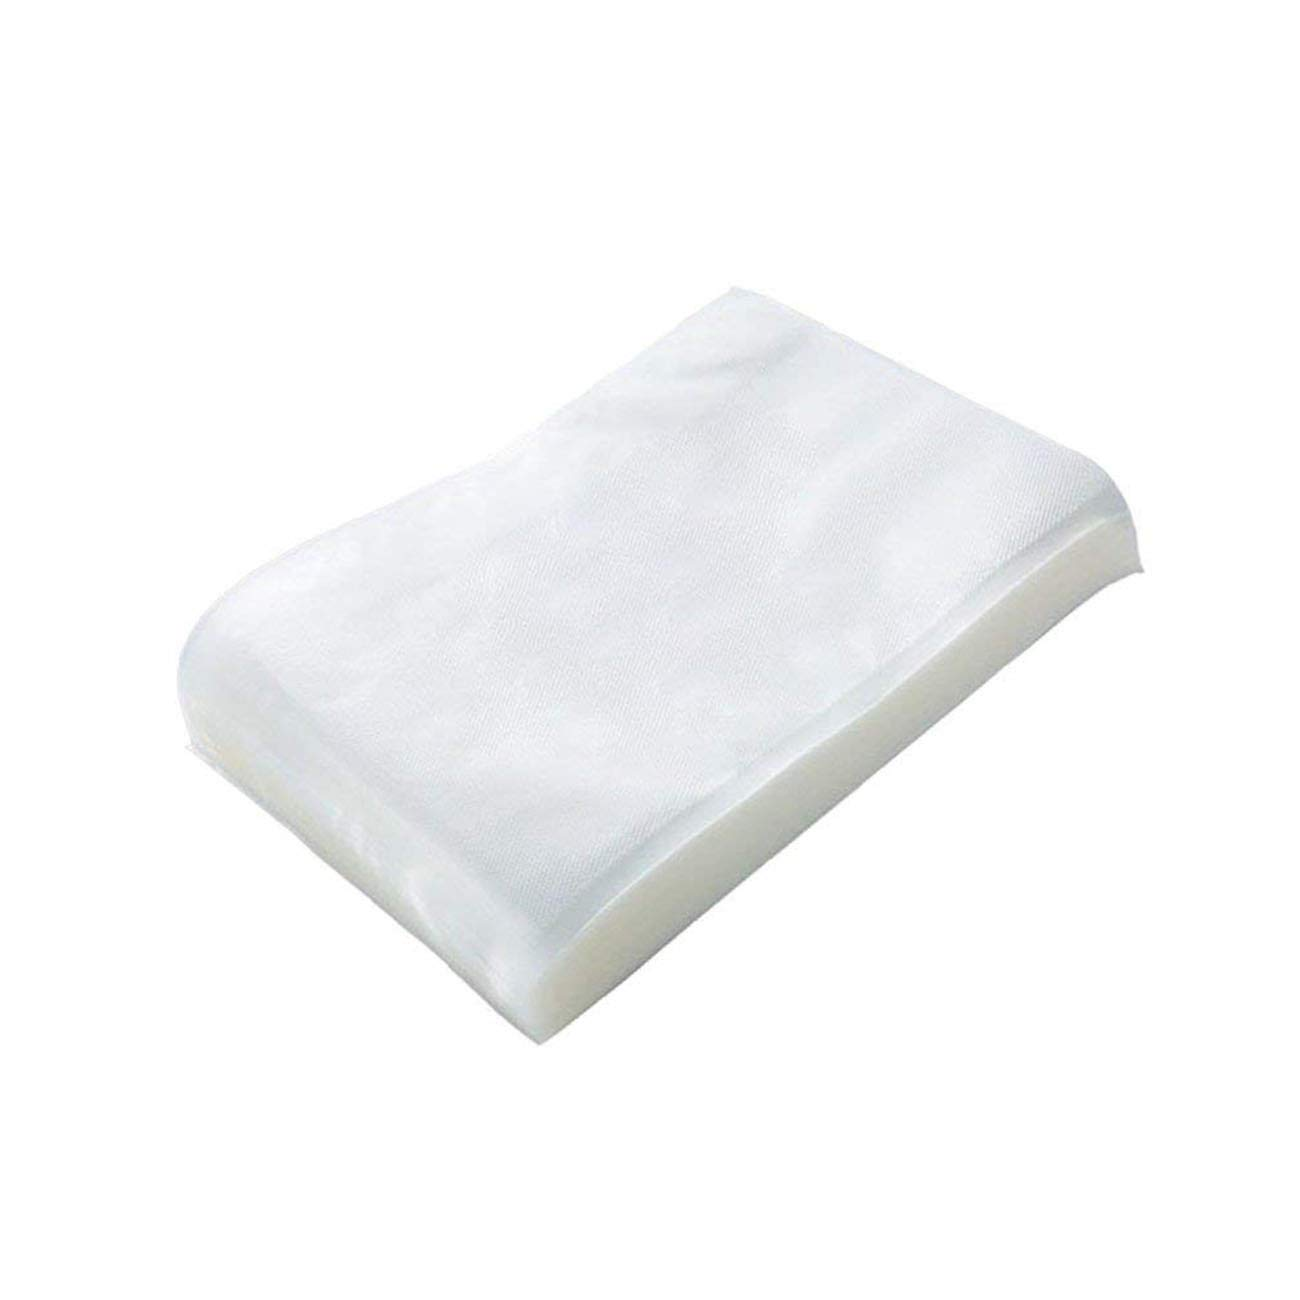 Meinstilin 100 Vacuum Sealer Storage Bags - 8x12 Quart Food Saver, Seal a Meal Type Vac Heat Sealers Commercial Grade BPA Free & Sous Vide Vaccume Cooking,100pcs Nopson-1